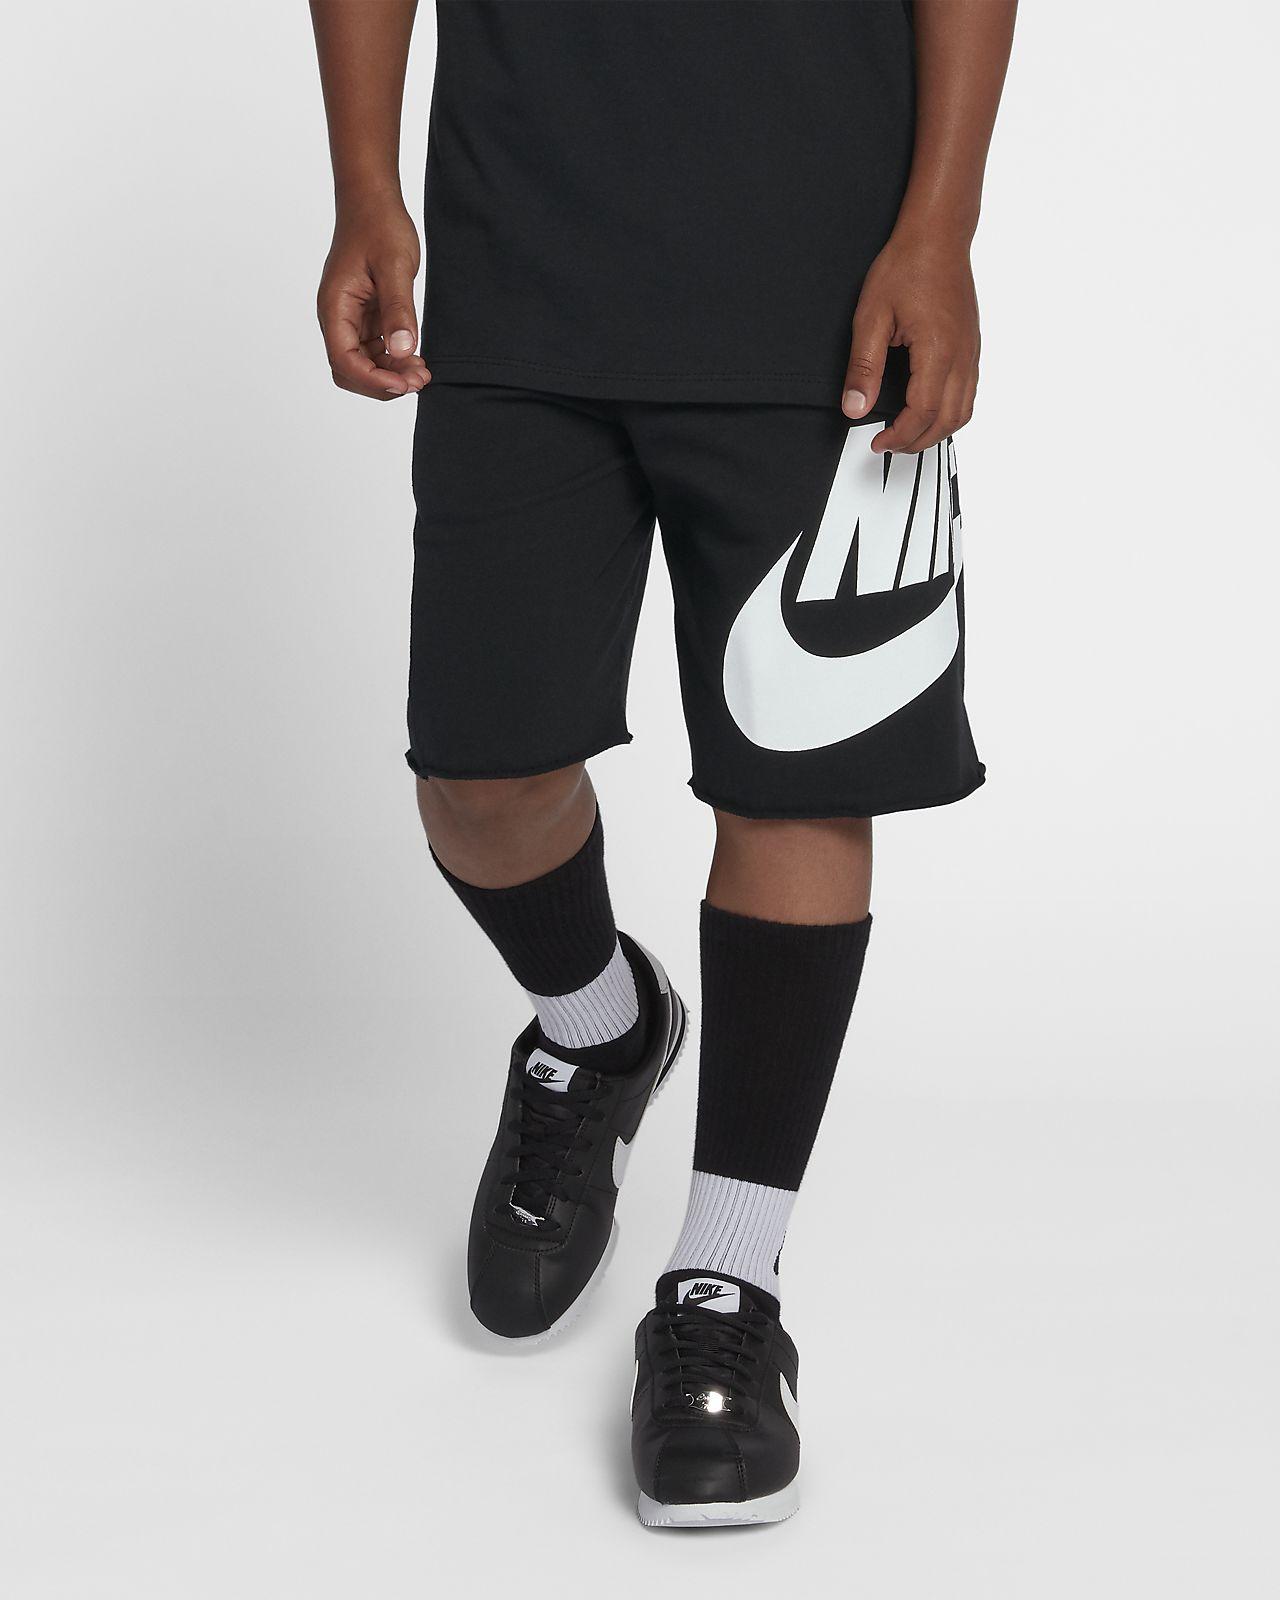 a13d6fddb8 Nike Sportswear Alumni Older Kids  (Boys ) Shorts. Nike.com IE